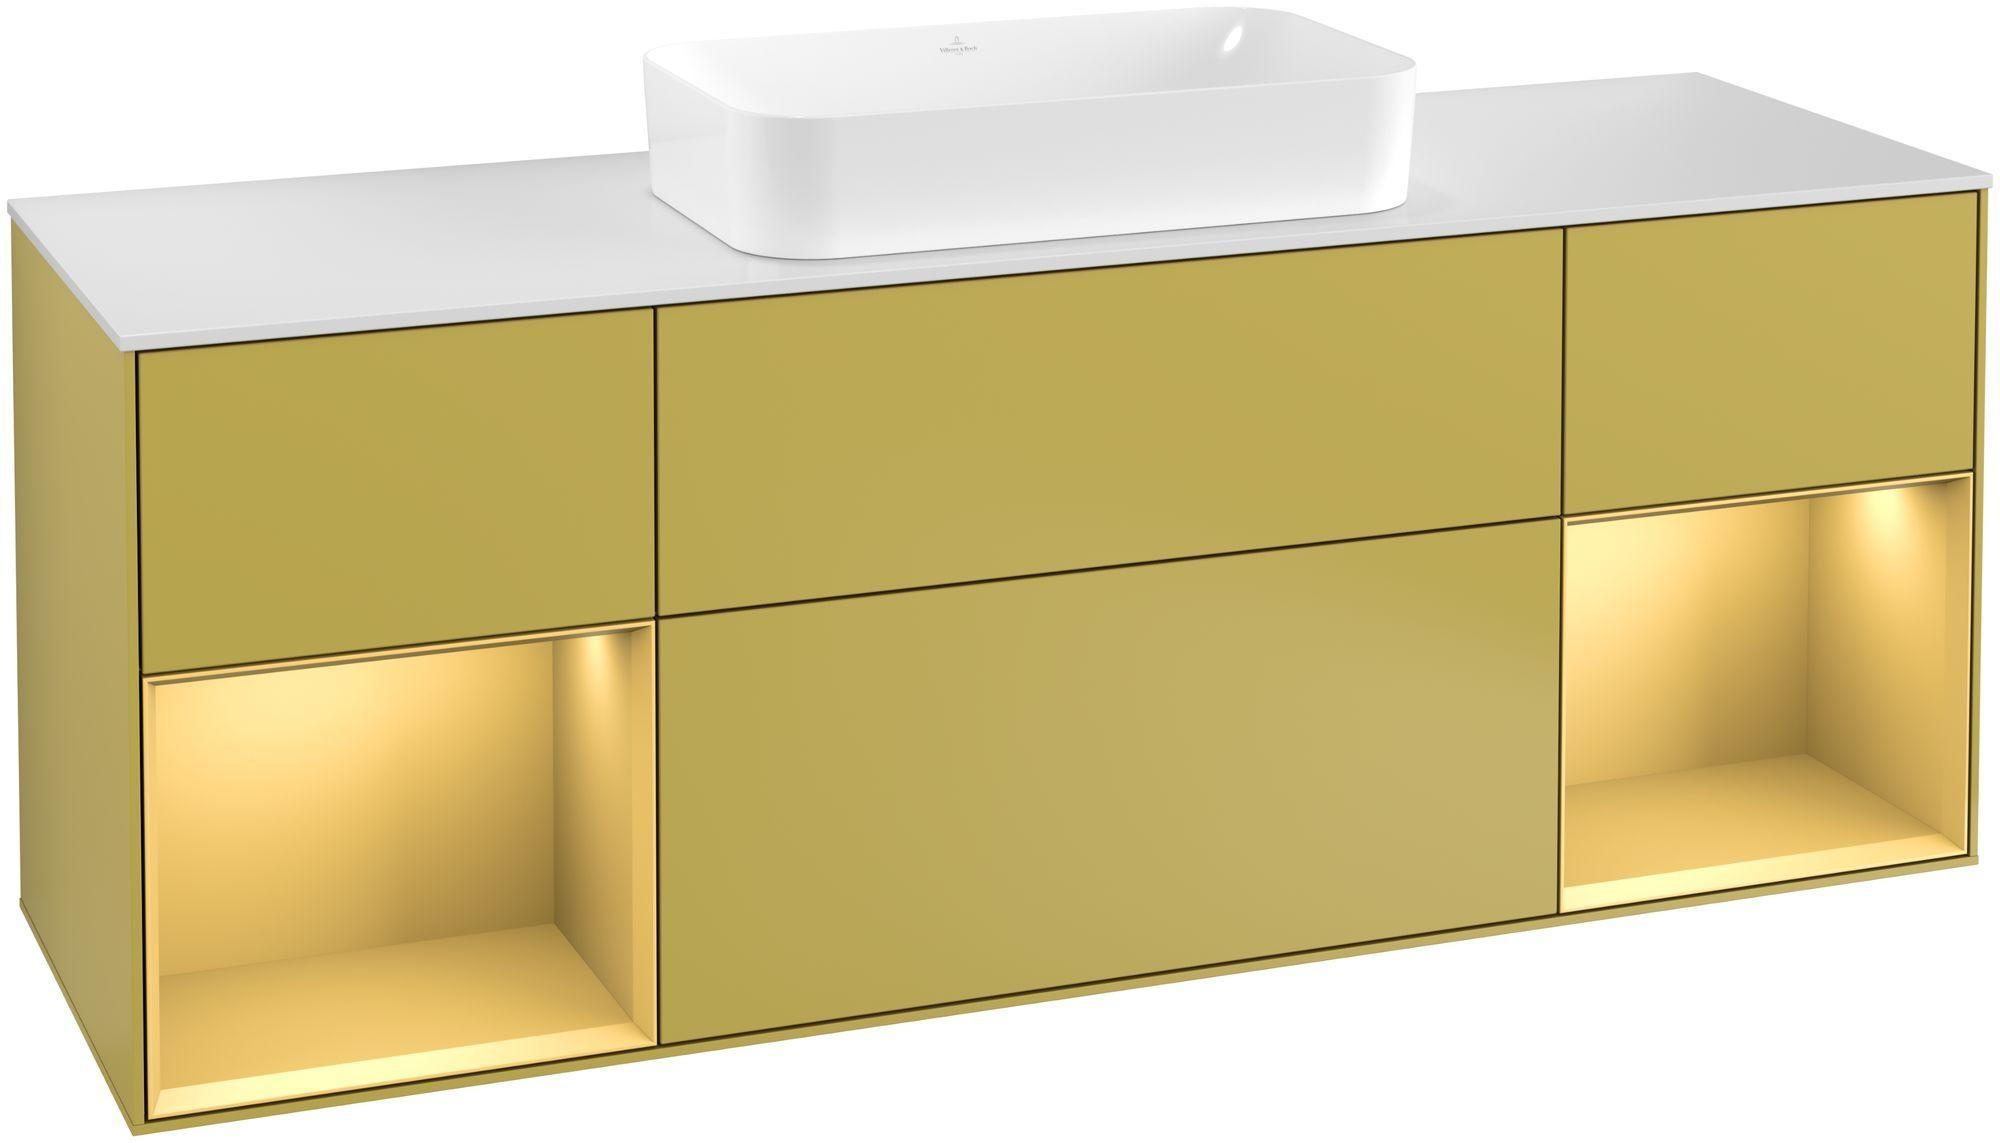 Villeroy & Boch Finion G33 Waschtischunterschrank mit Regalelement 4 Auszüge Waschtisch mittig LED-Beleuchtung B:160xH:60,3xT:50,1cm Front, Korpus: Sun, Regal: Gold Matt, Glasplatte: White Matt G331HFHE